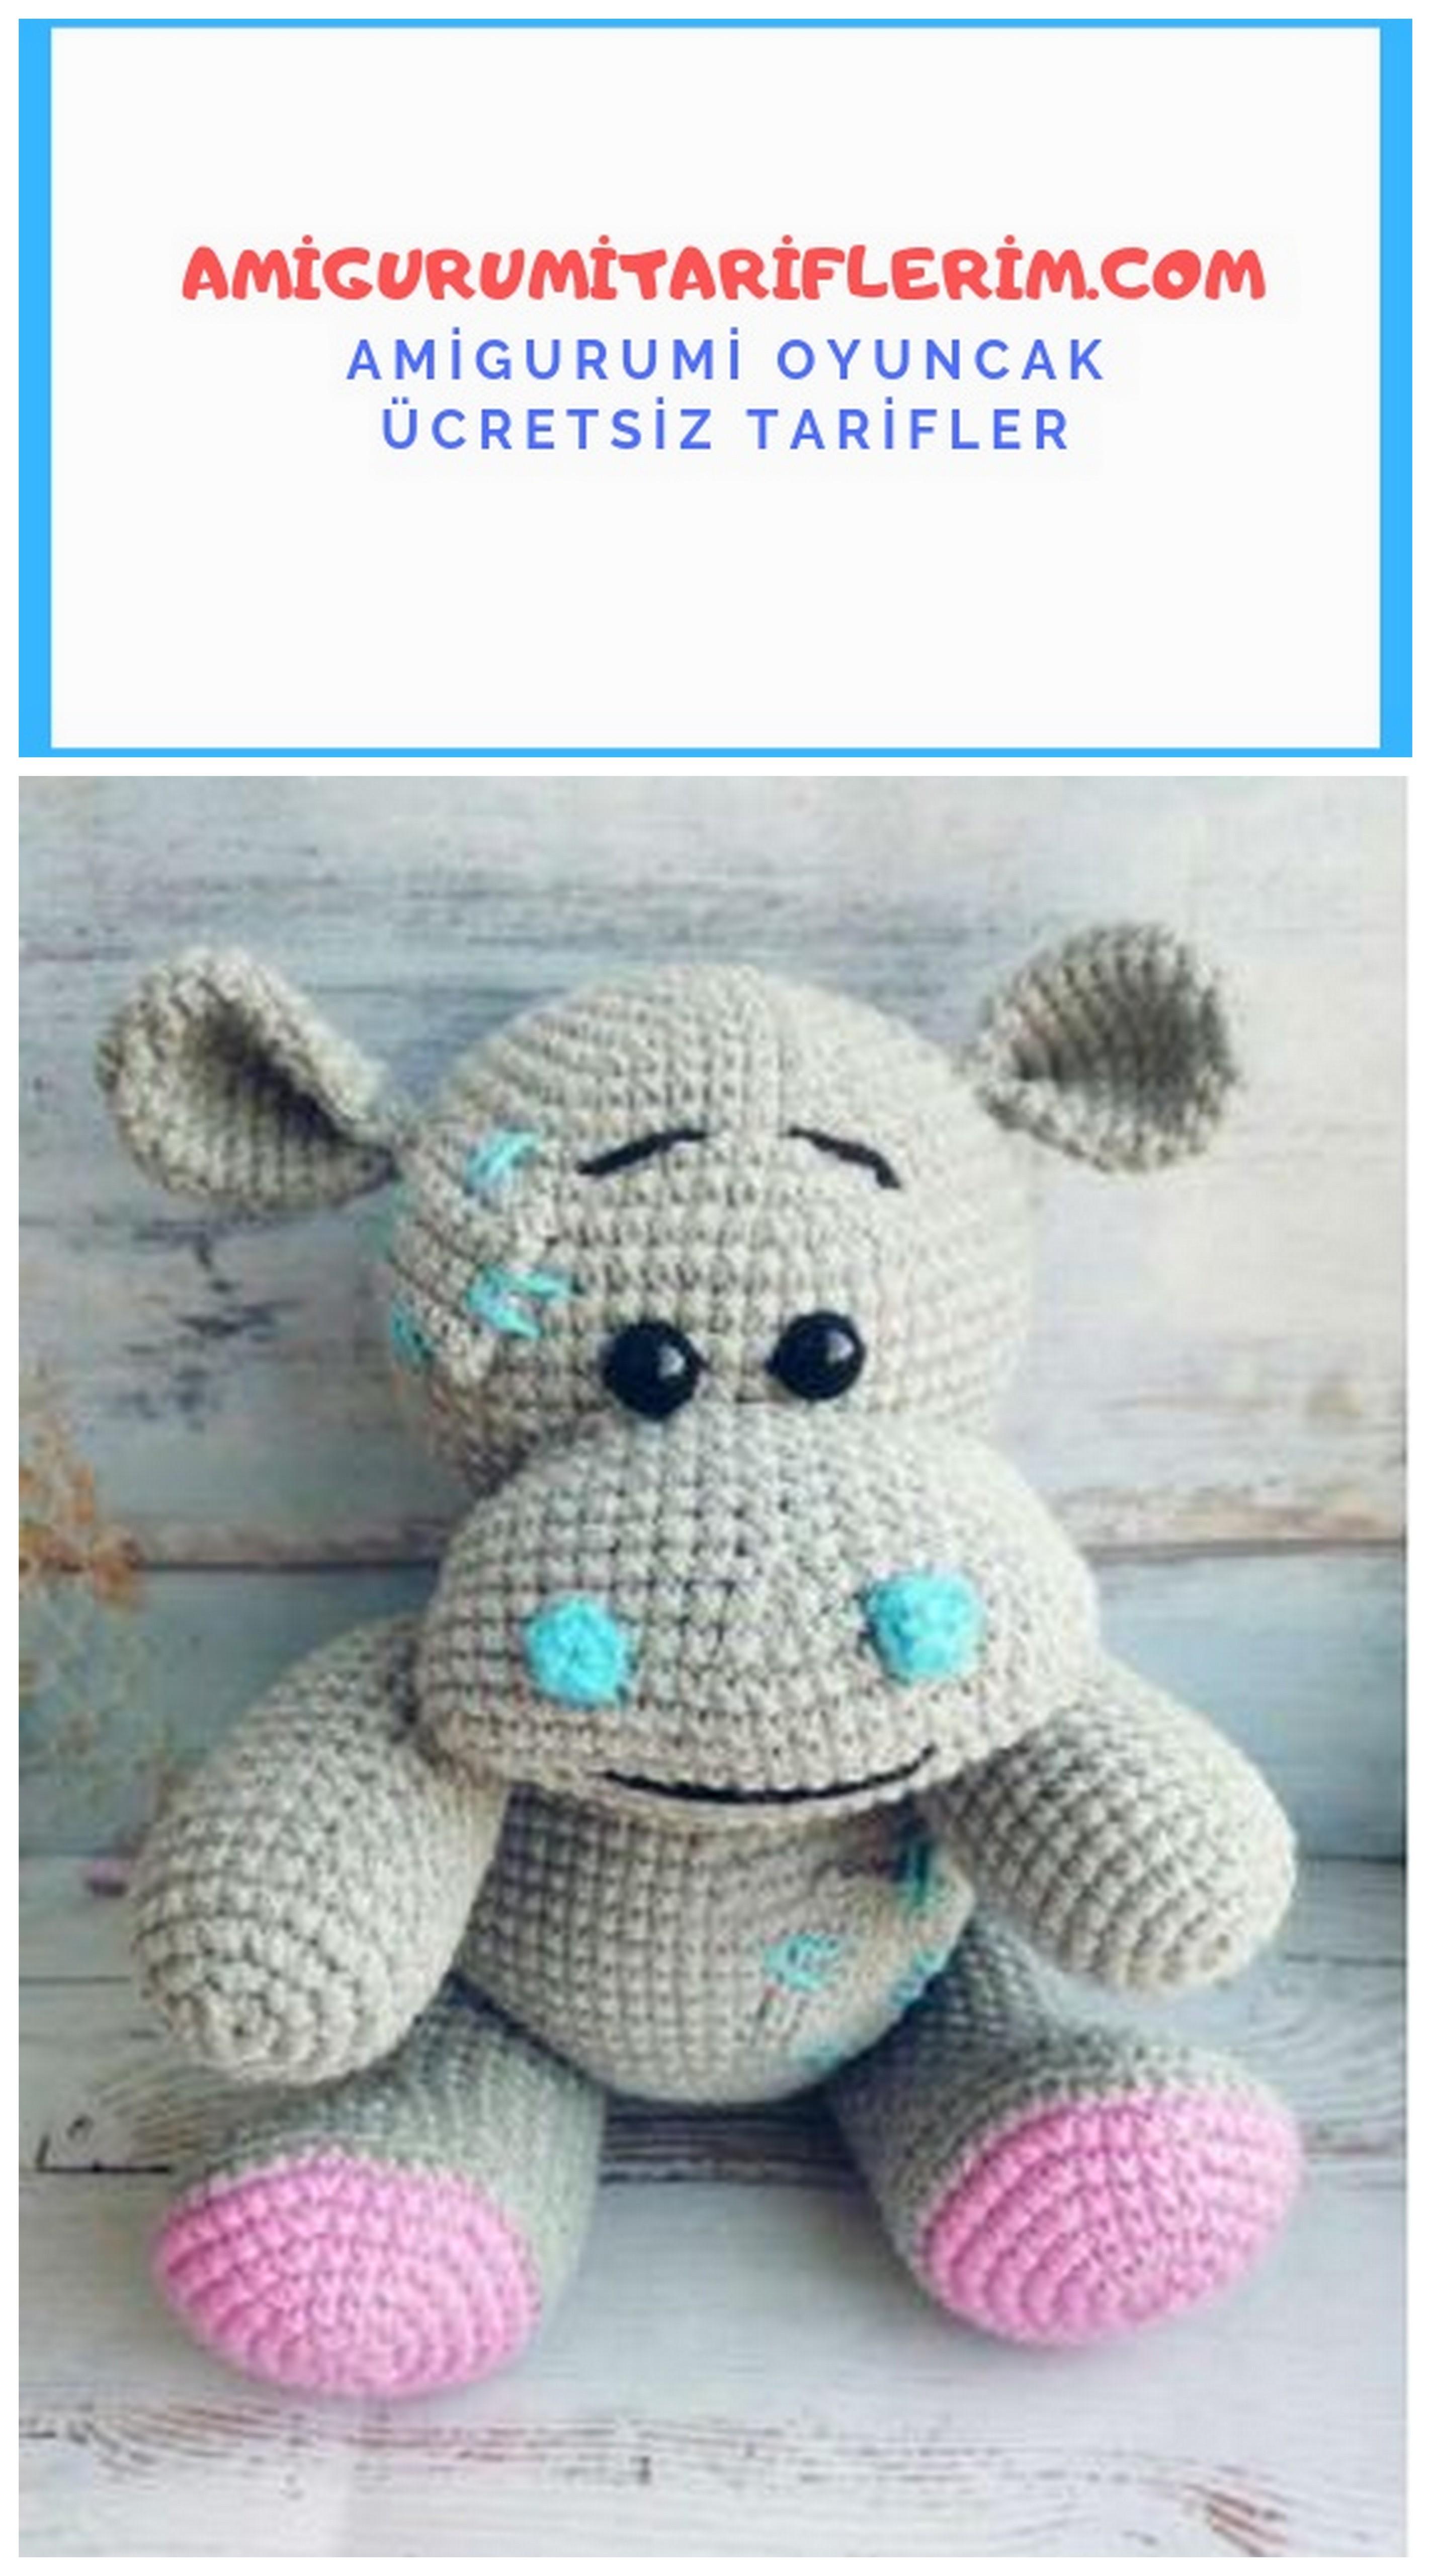 Amigurumi Aşkına: Amigurumi Hippo- Su aygırı Yapılışı | Crochet ... | 5120x2845